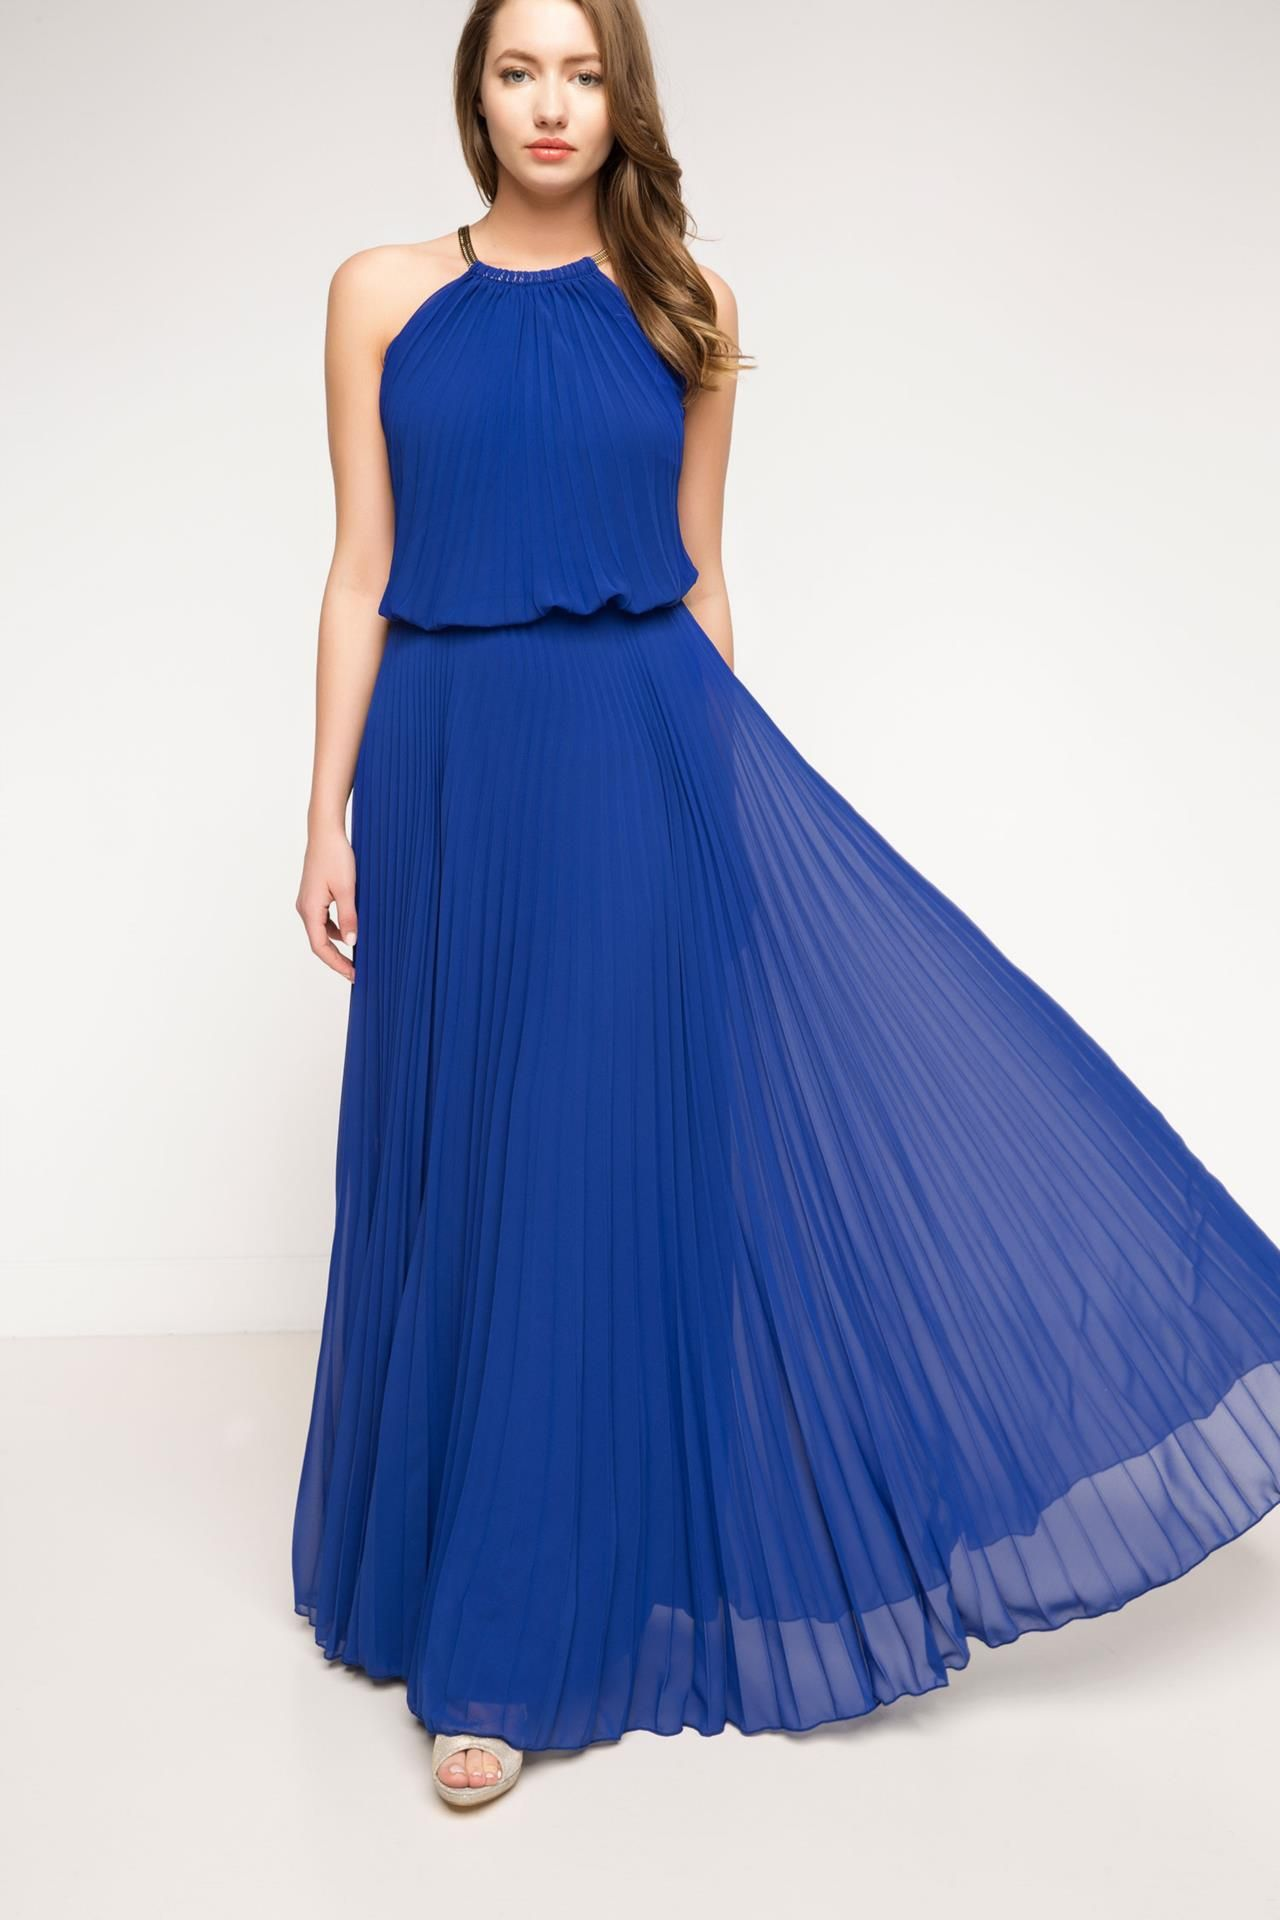 Mavi Kadin Abiye Elbise 710440 Defacto The Dress Elbise Dress Outfits